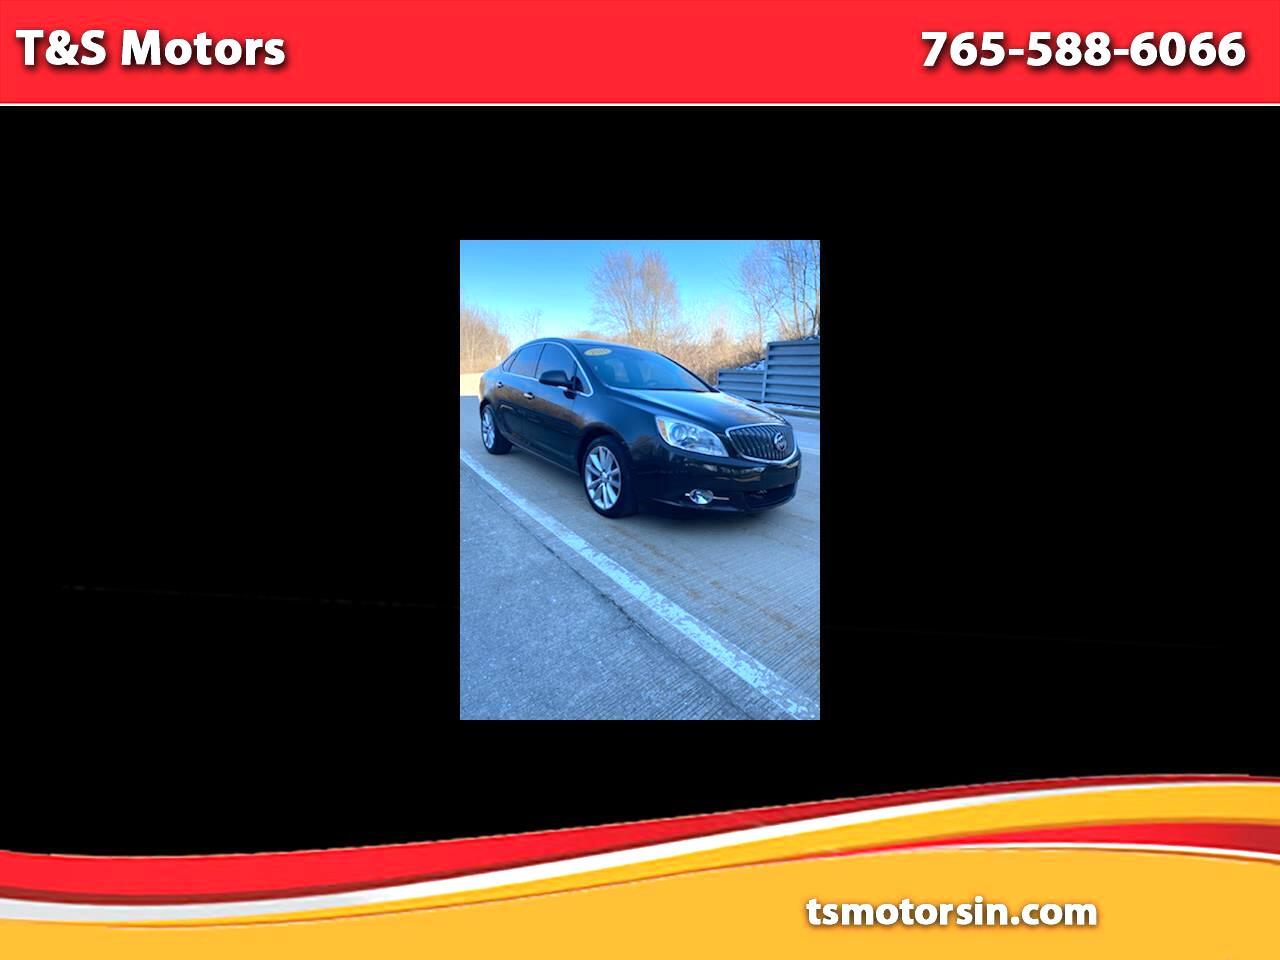 Buick Verano Convenience 2014